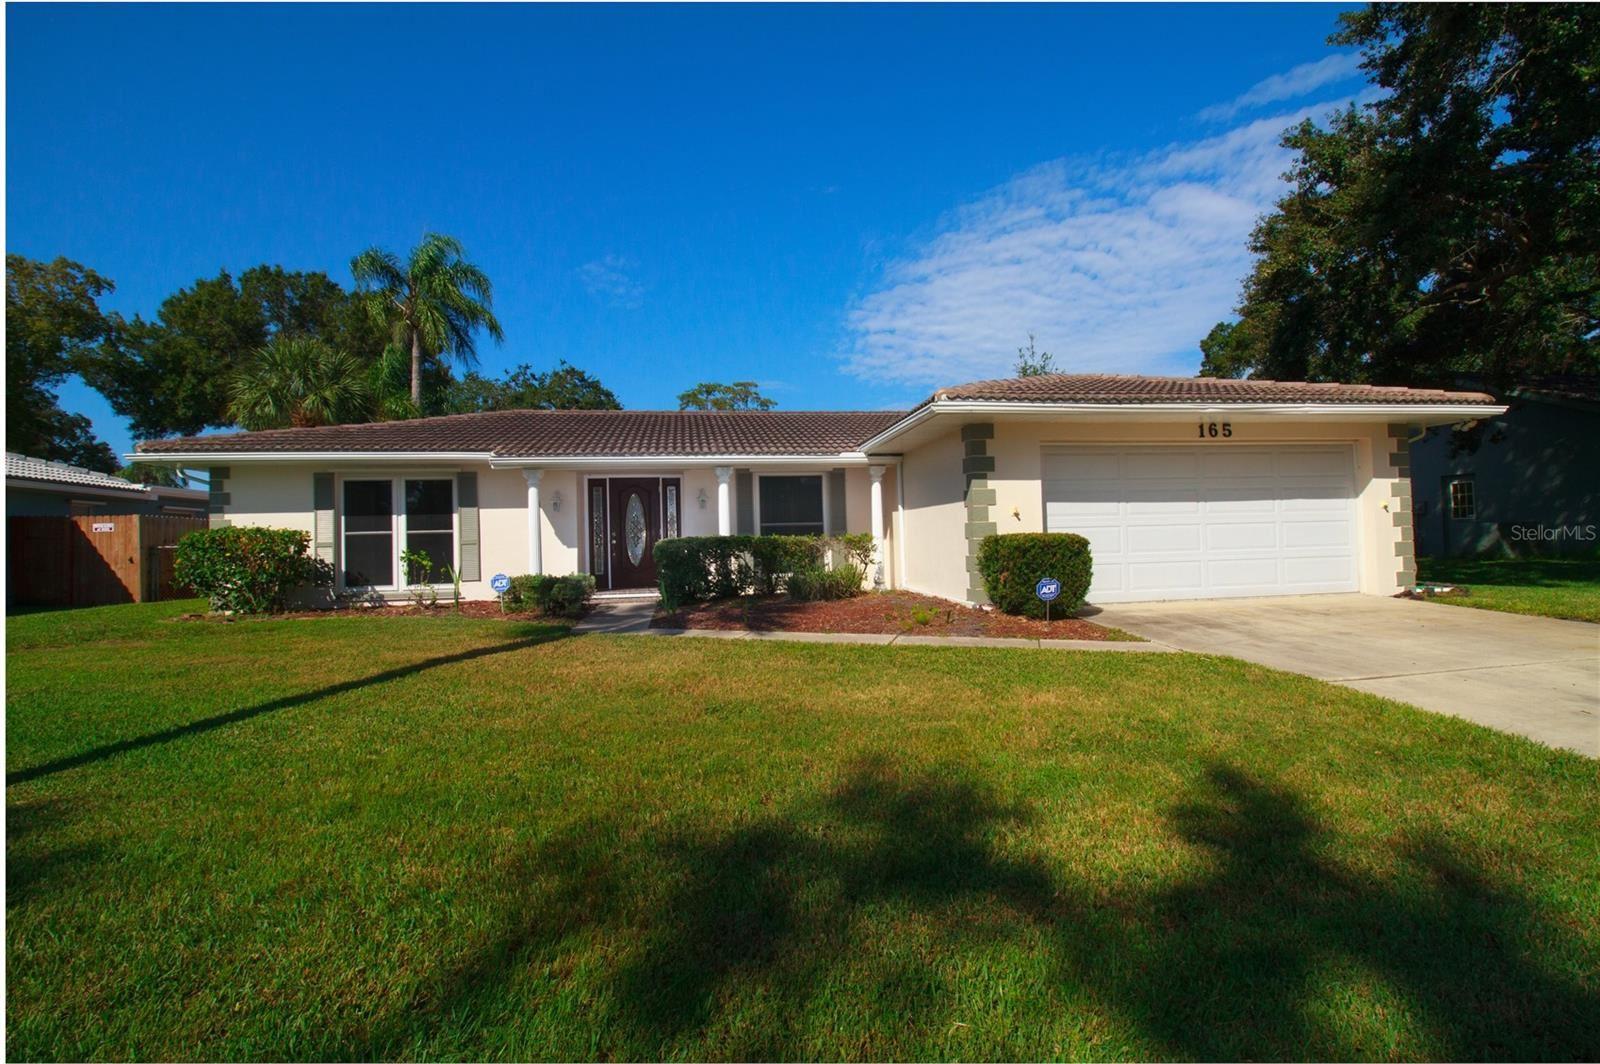 165 PATTY ANN BOULEVARD, Palm Harbor, FL 34683 - #: U8139343